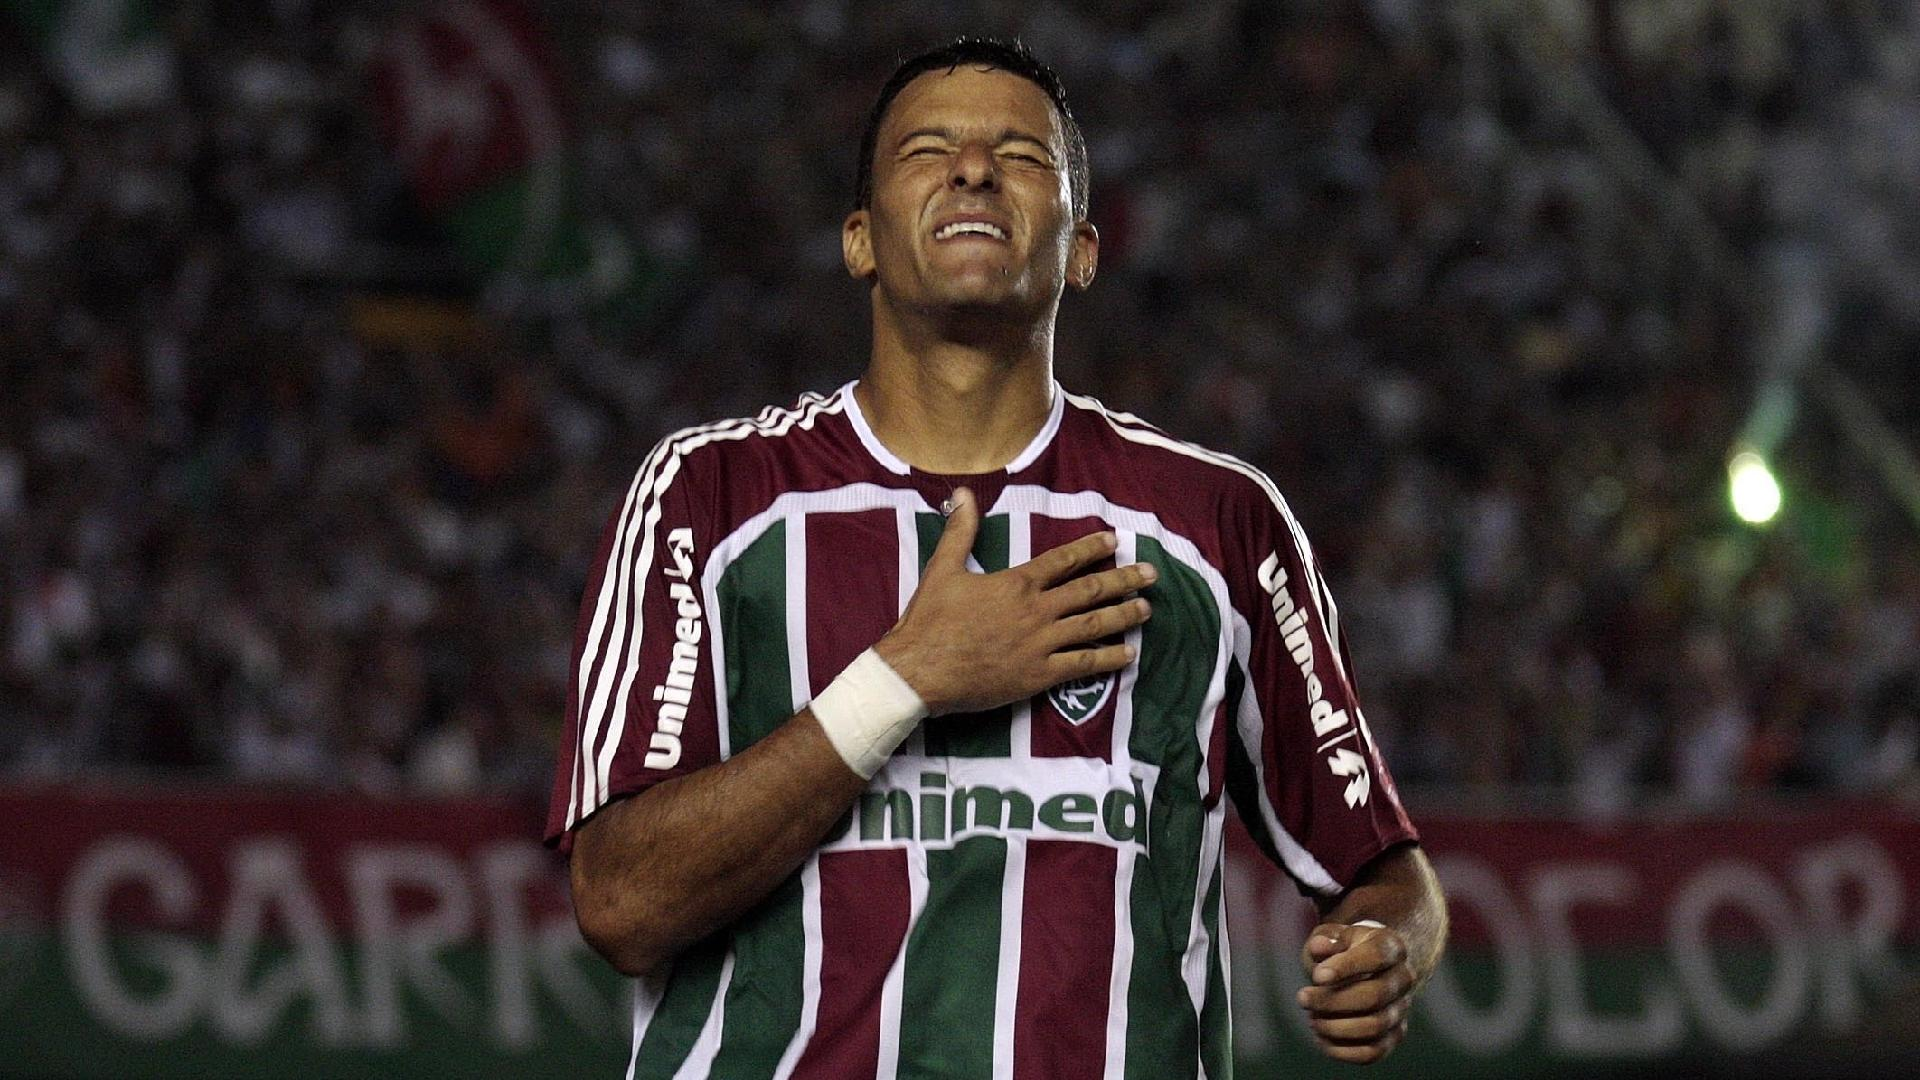 Washington comemora gol pelo Fluminense